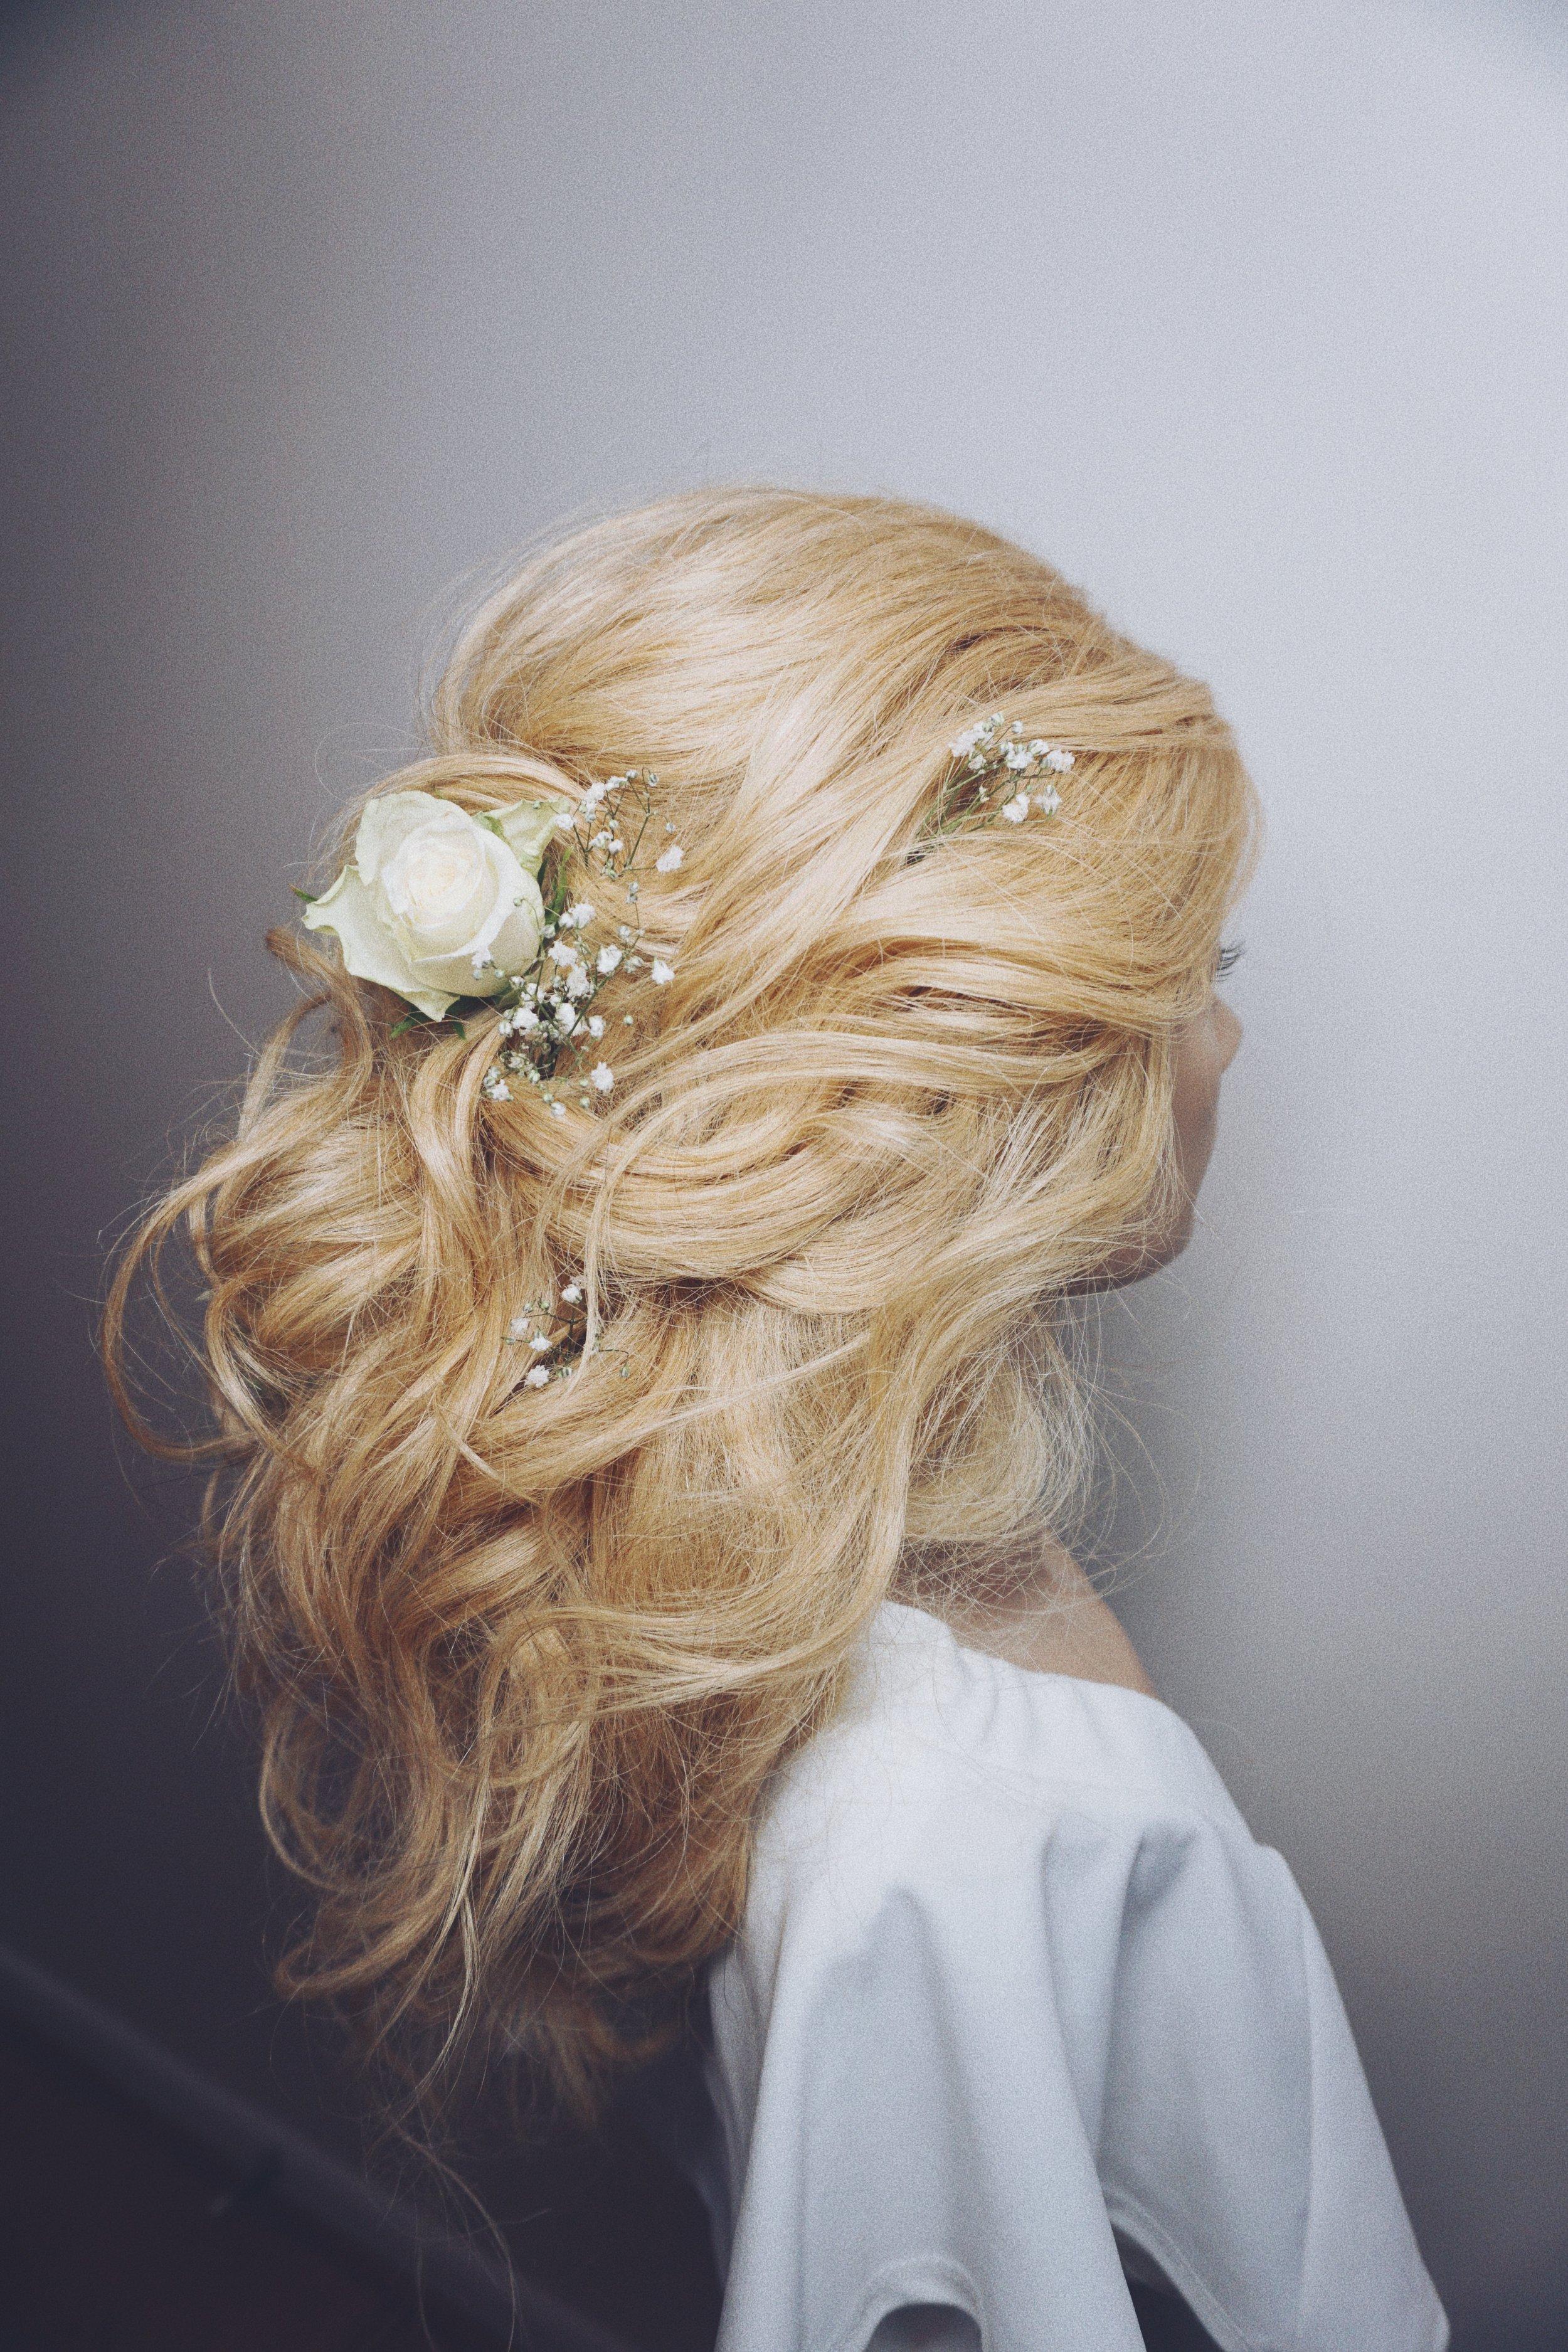 hair accessories for wedding hairstyle ideas half up half down